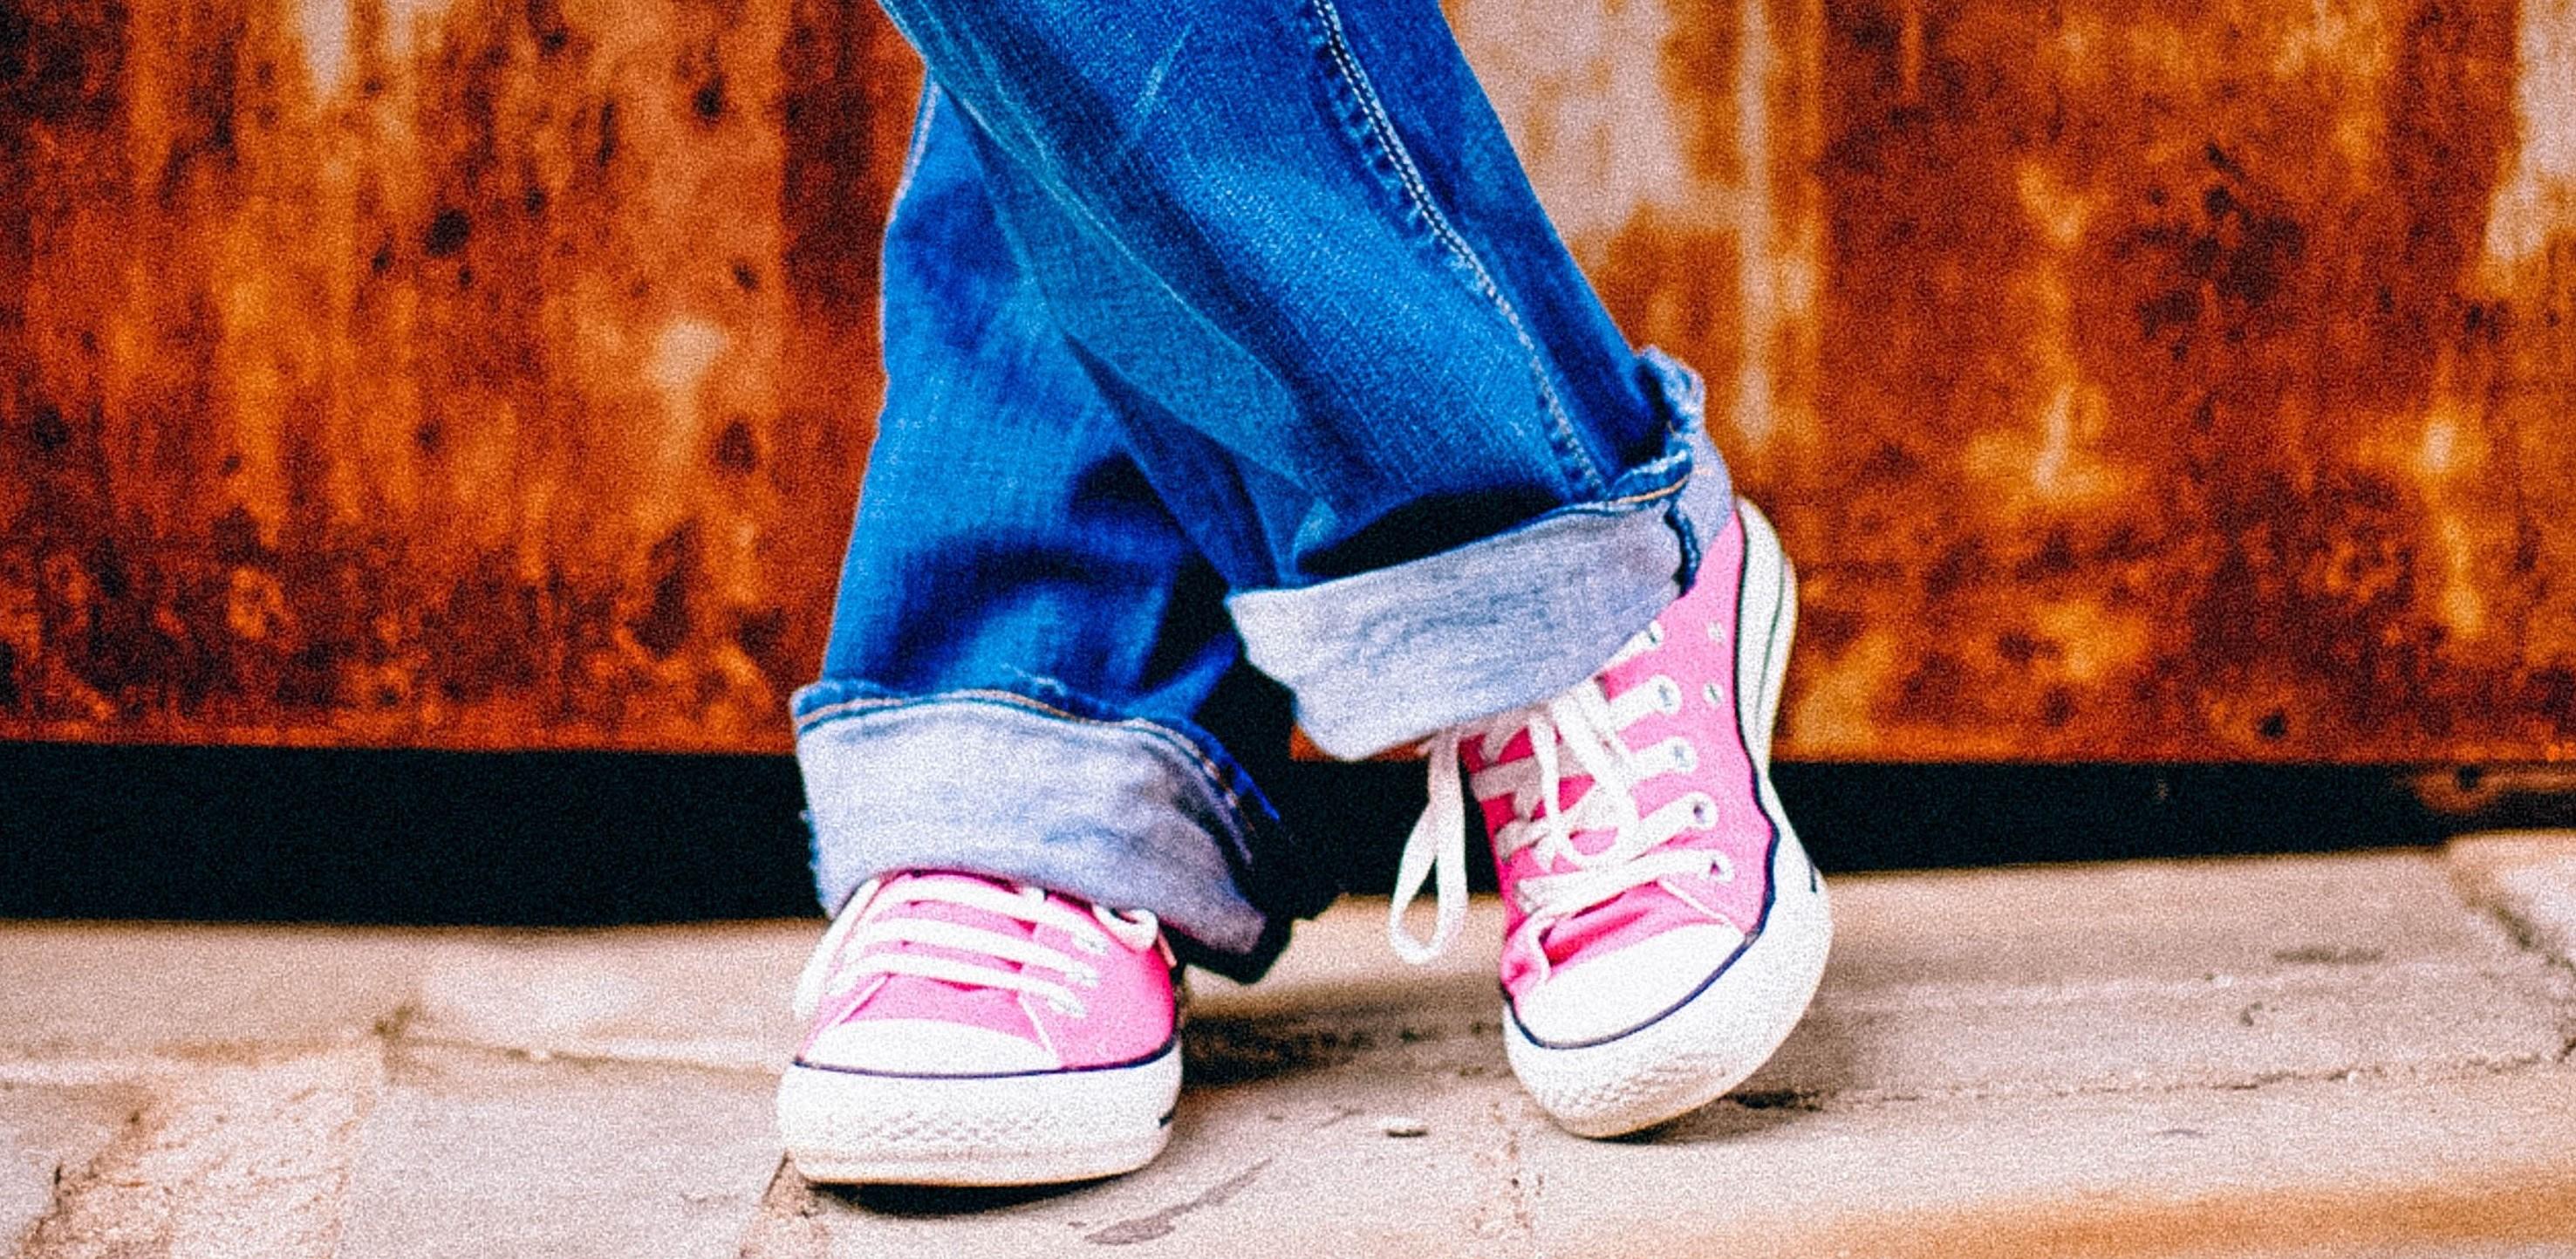 feet-legs-standing-waiting-55801_pexels_Cropped